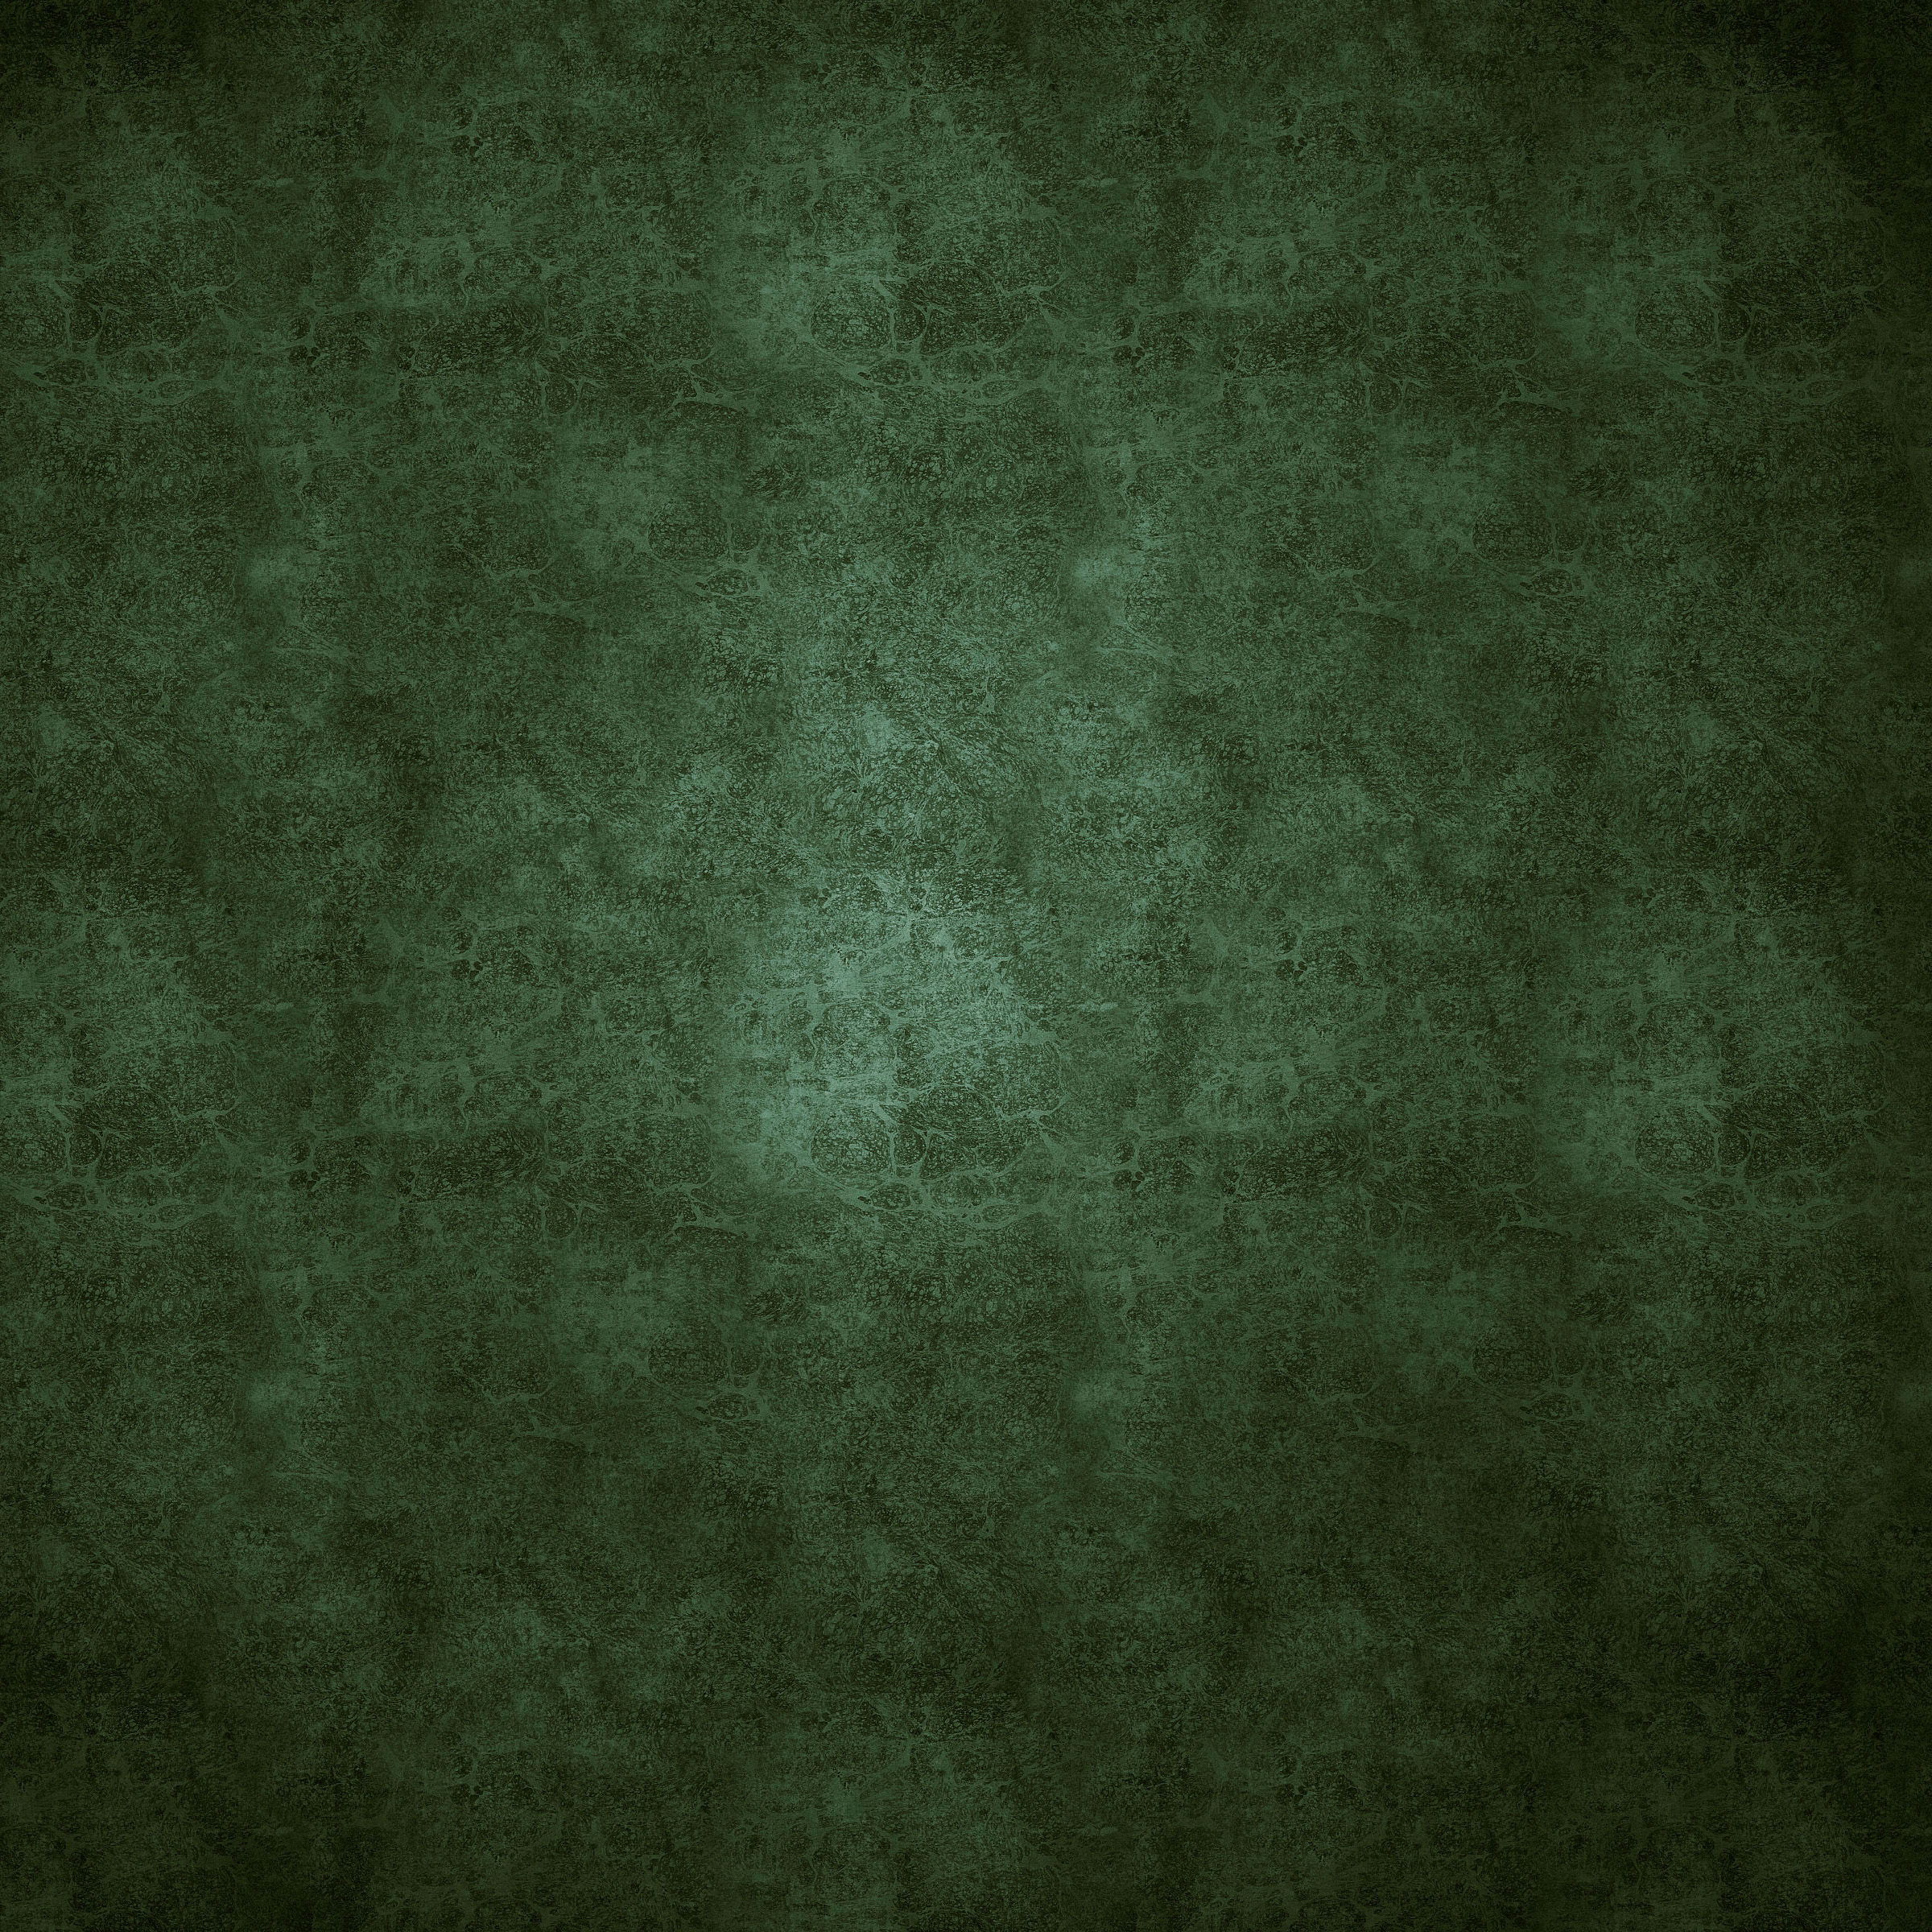 Dark Green Template Backgrounds